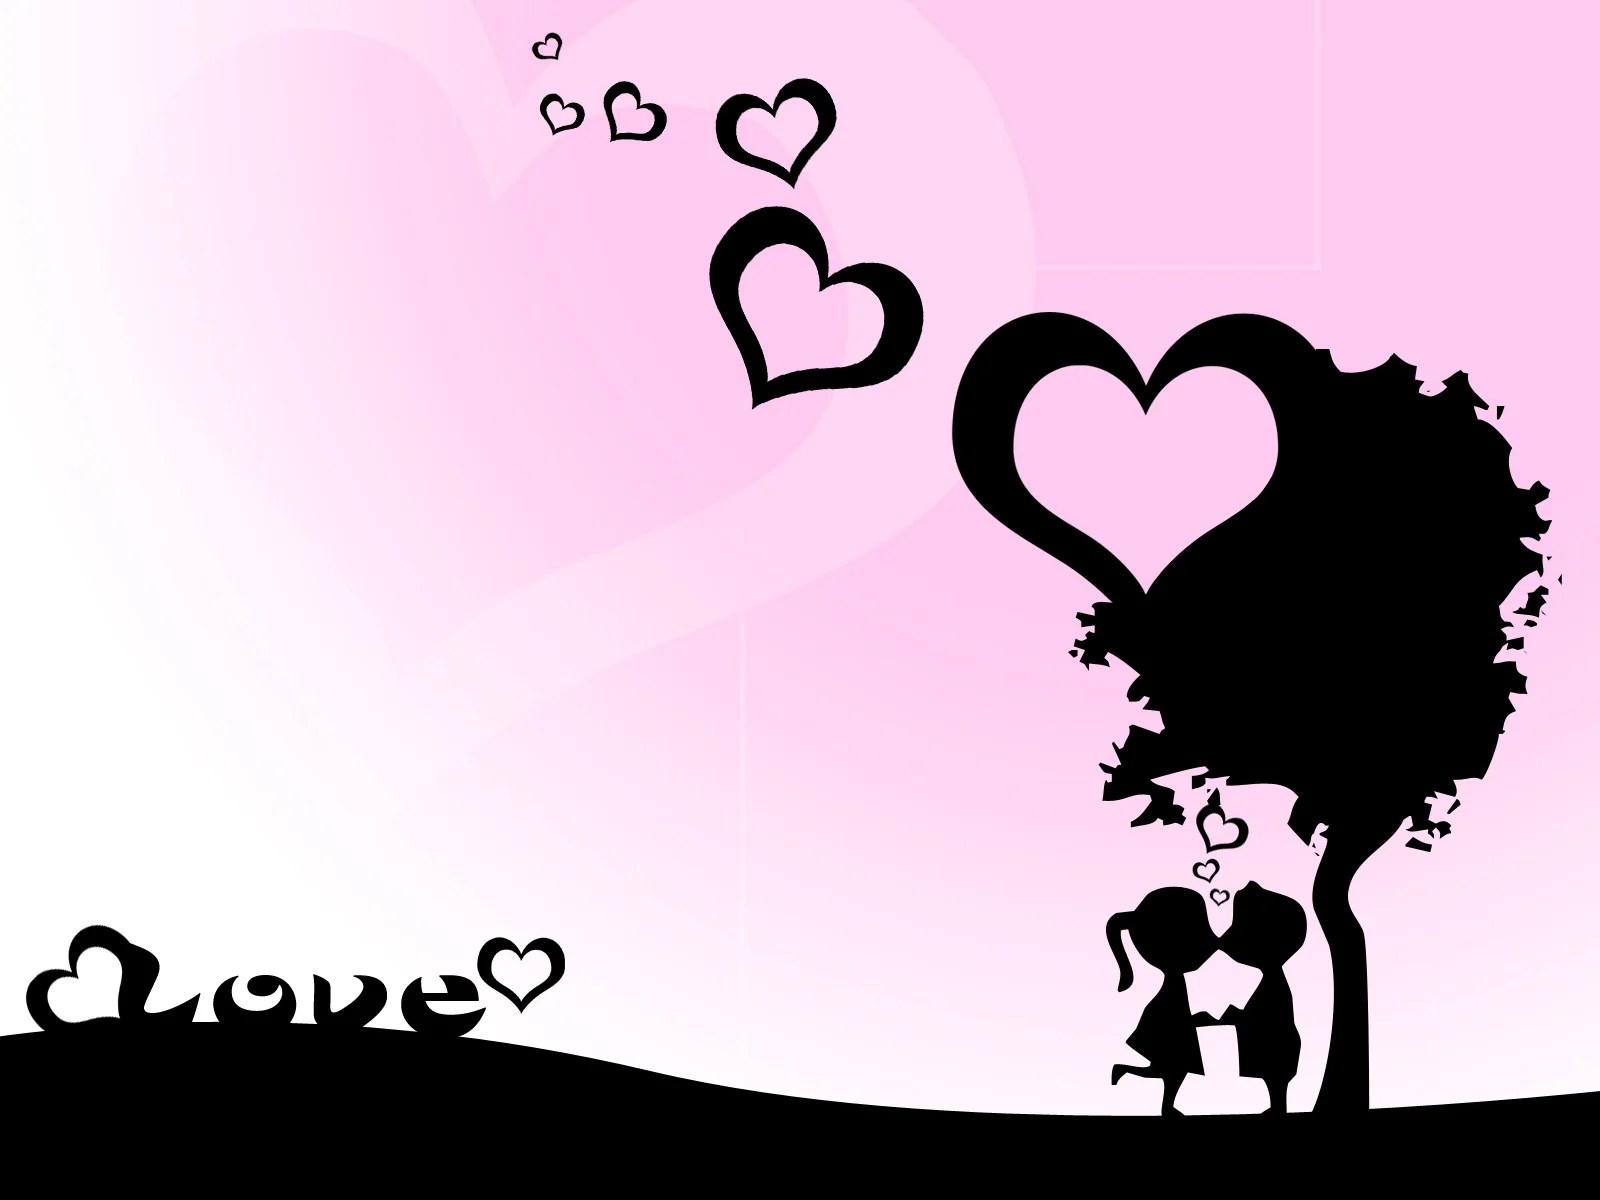 Sweet & Cute Love Wallpapers | HD Wallpapers | ID #6592